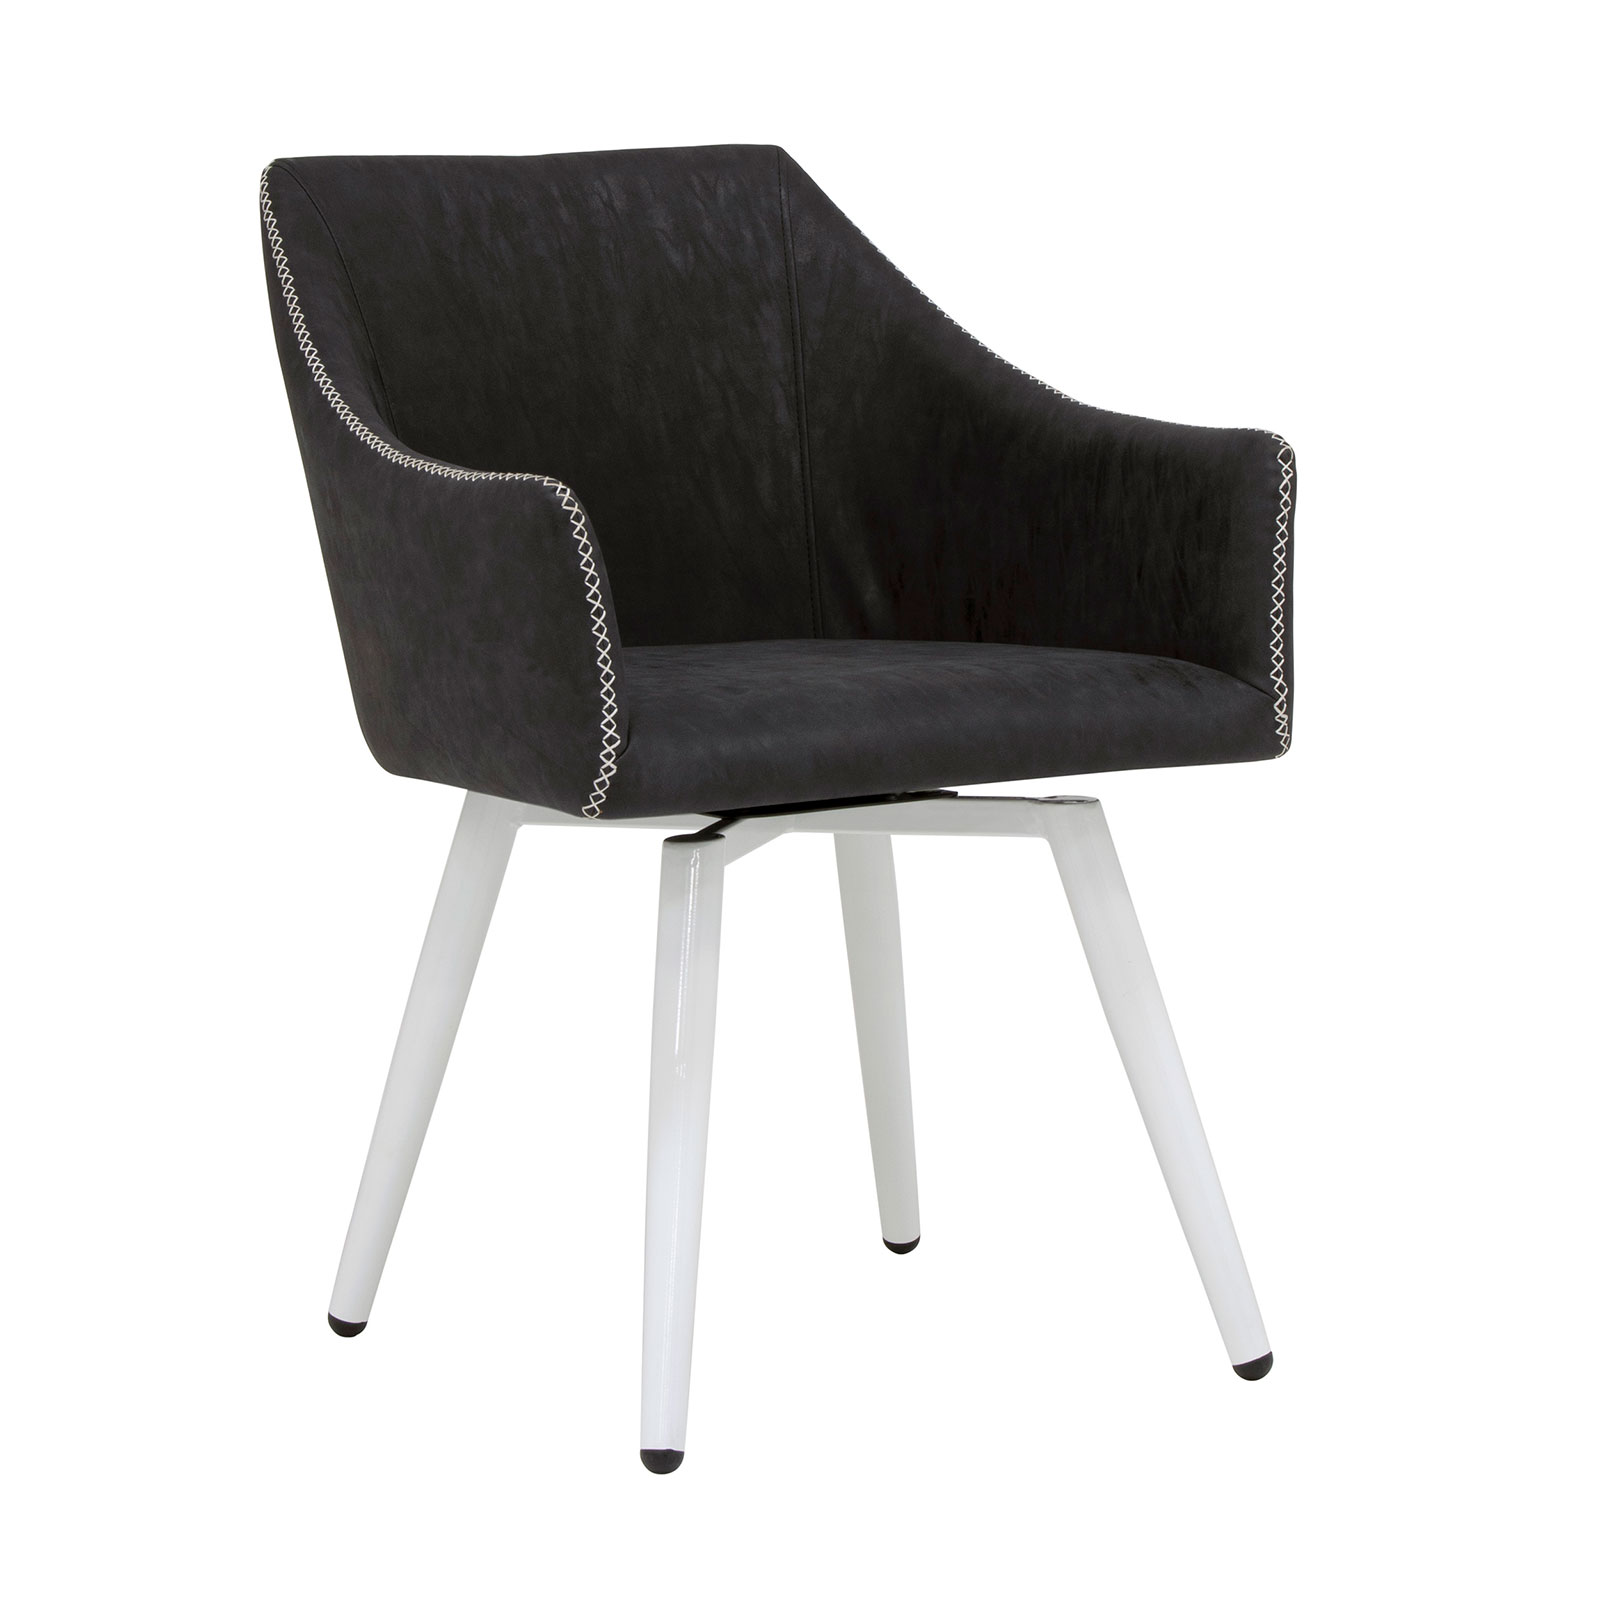 52004-Sydney-Office-Chair